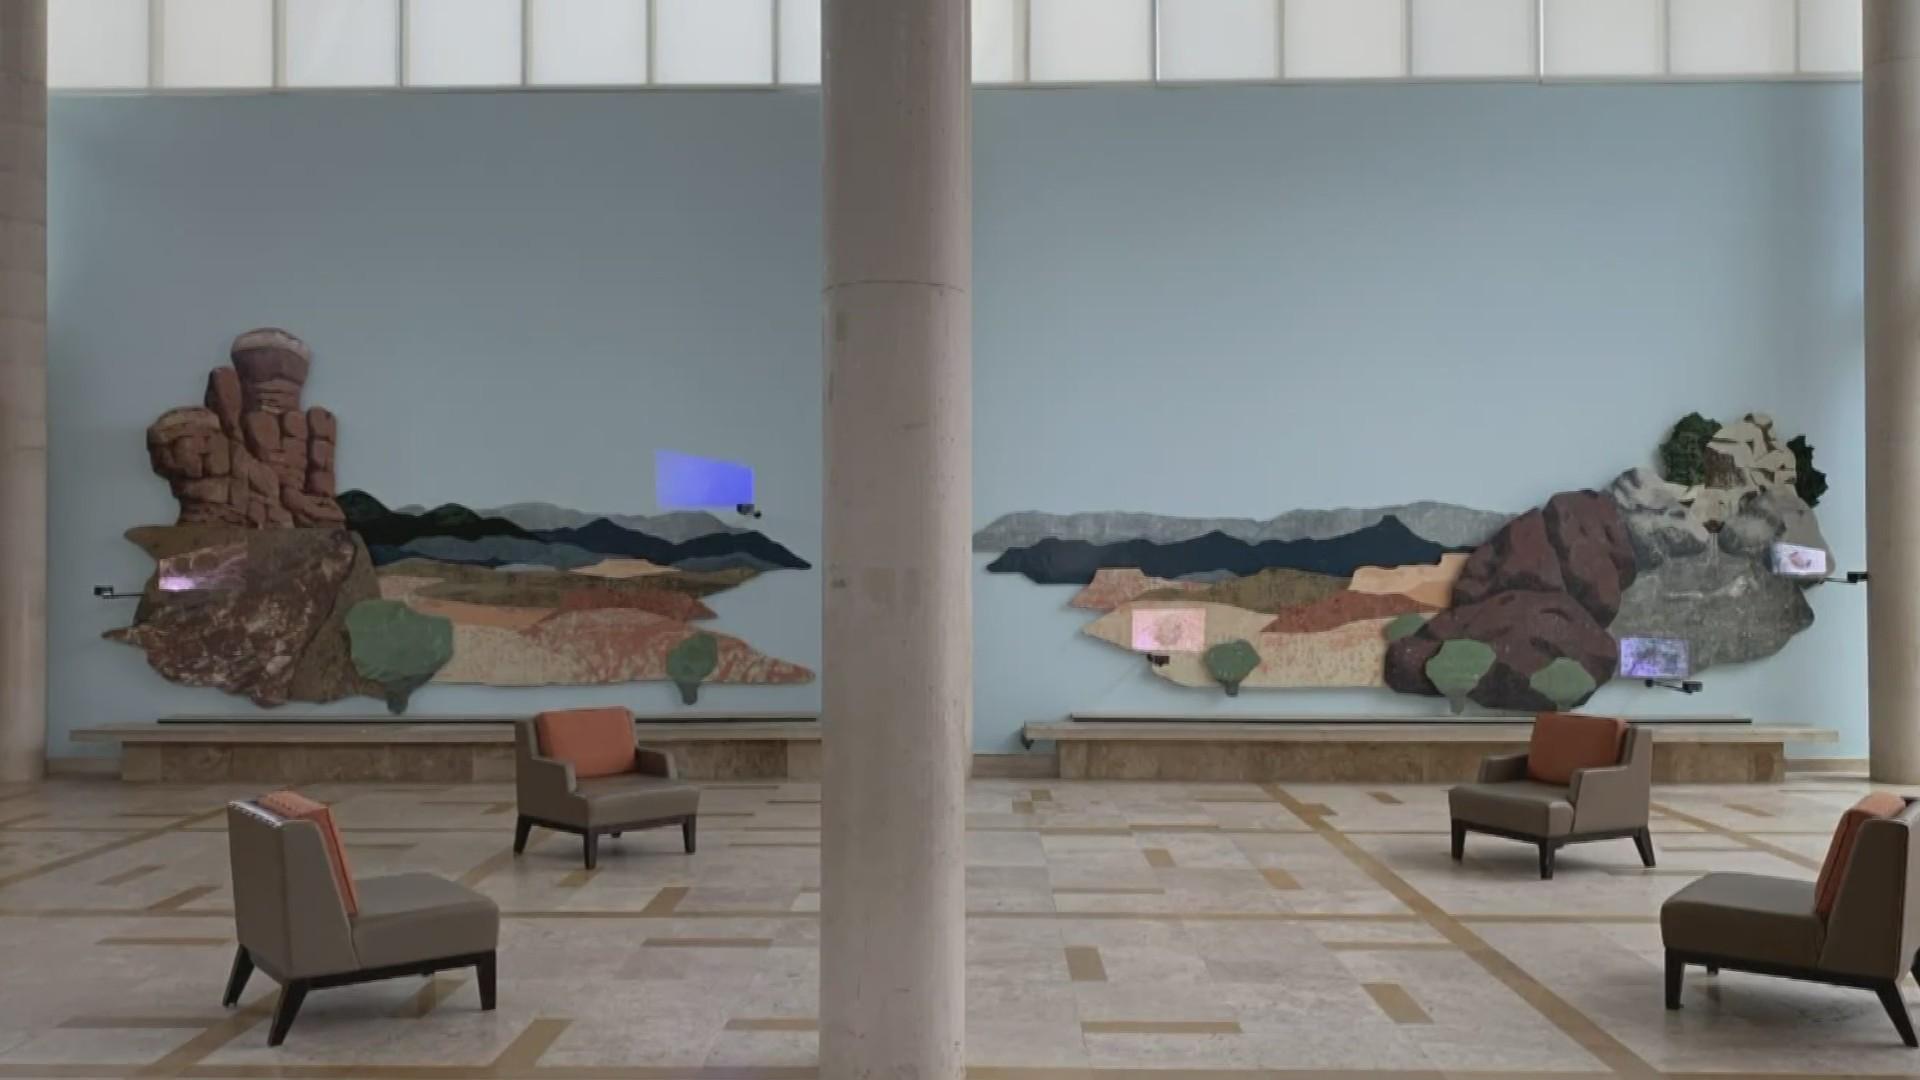 Albuquerque Museum Welcomes 2 New Art Installations Krqe News 13